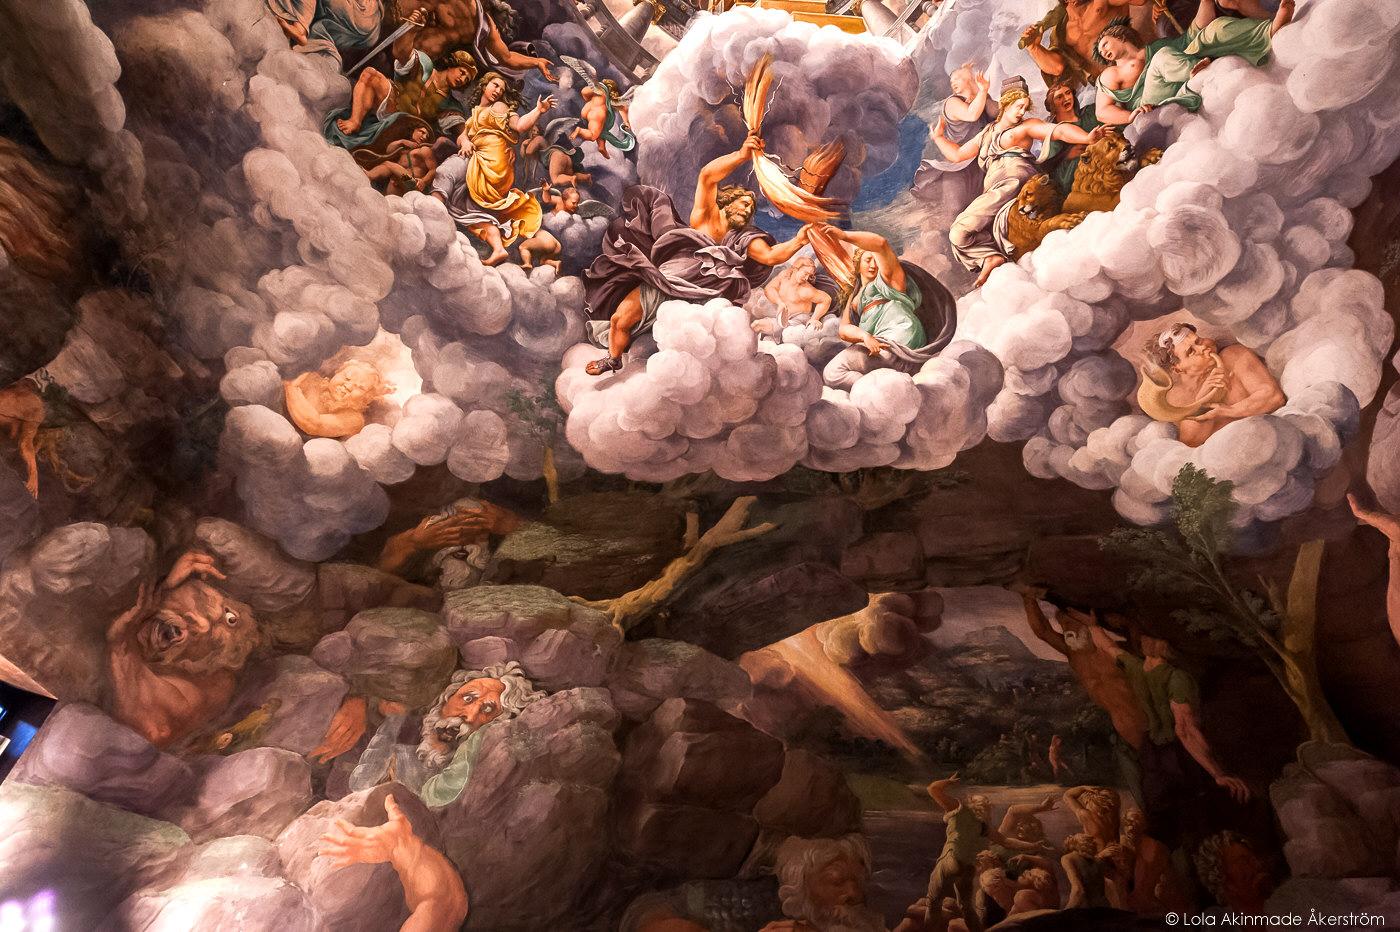 In Photos: Exploring Italian Renaissance in Mantua